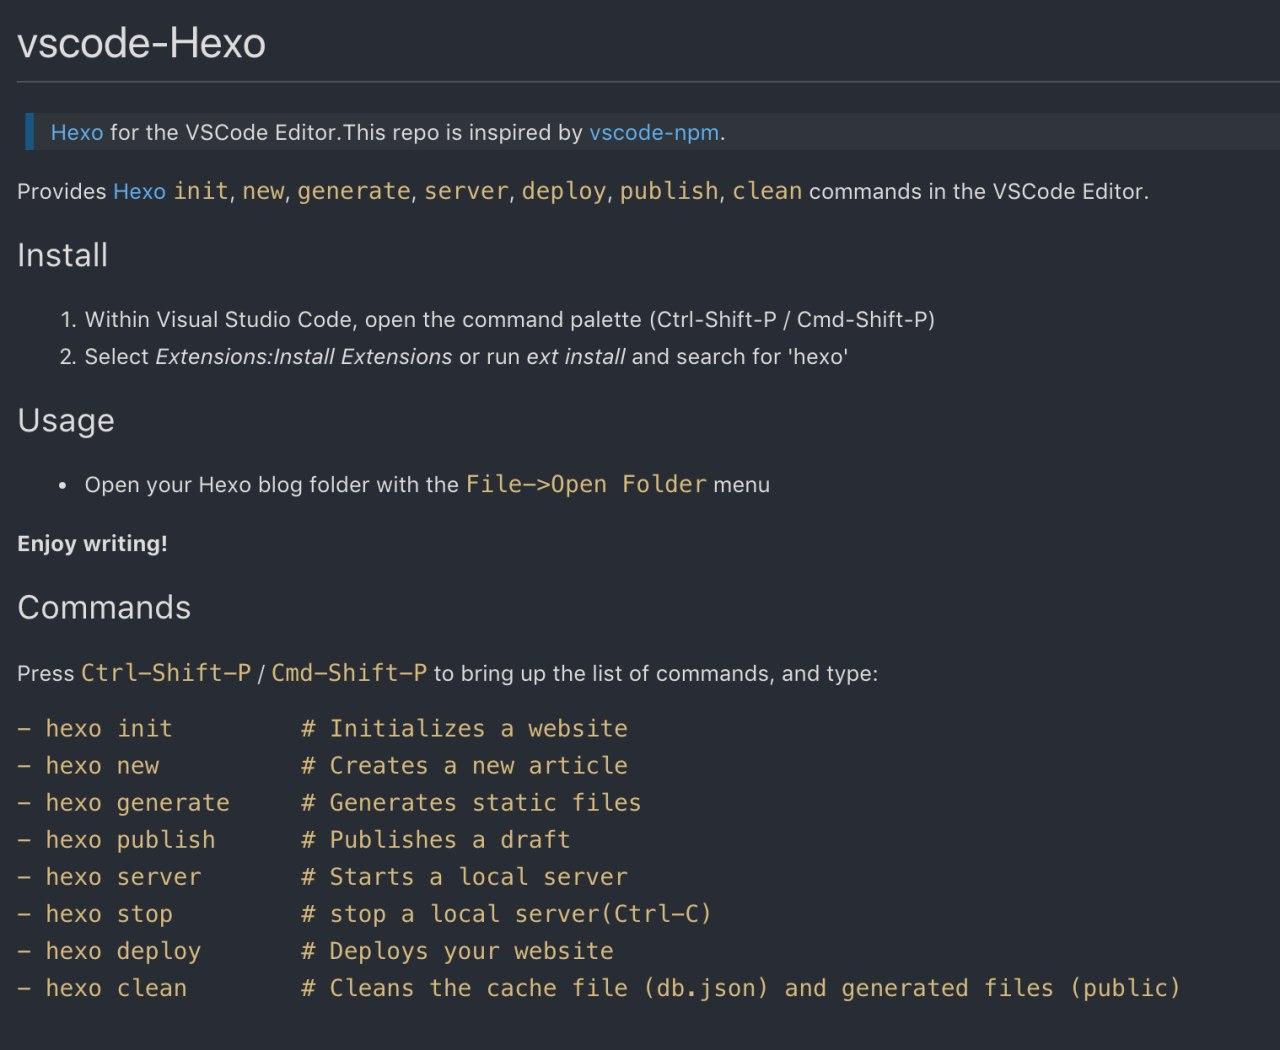 hexo-info